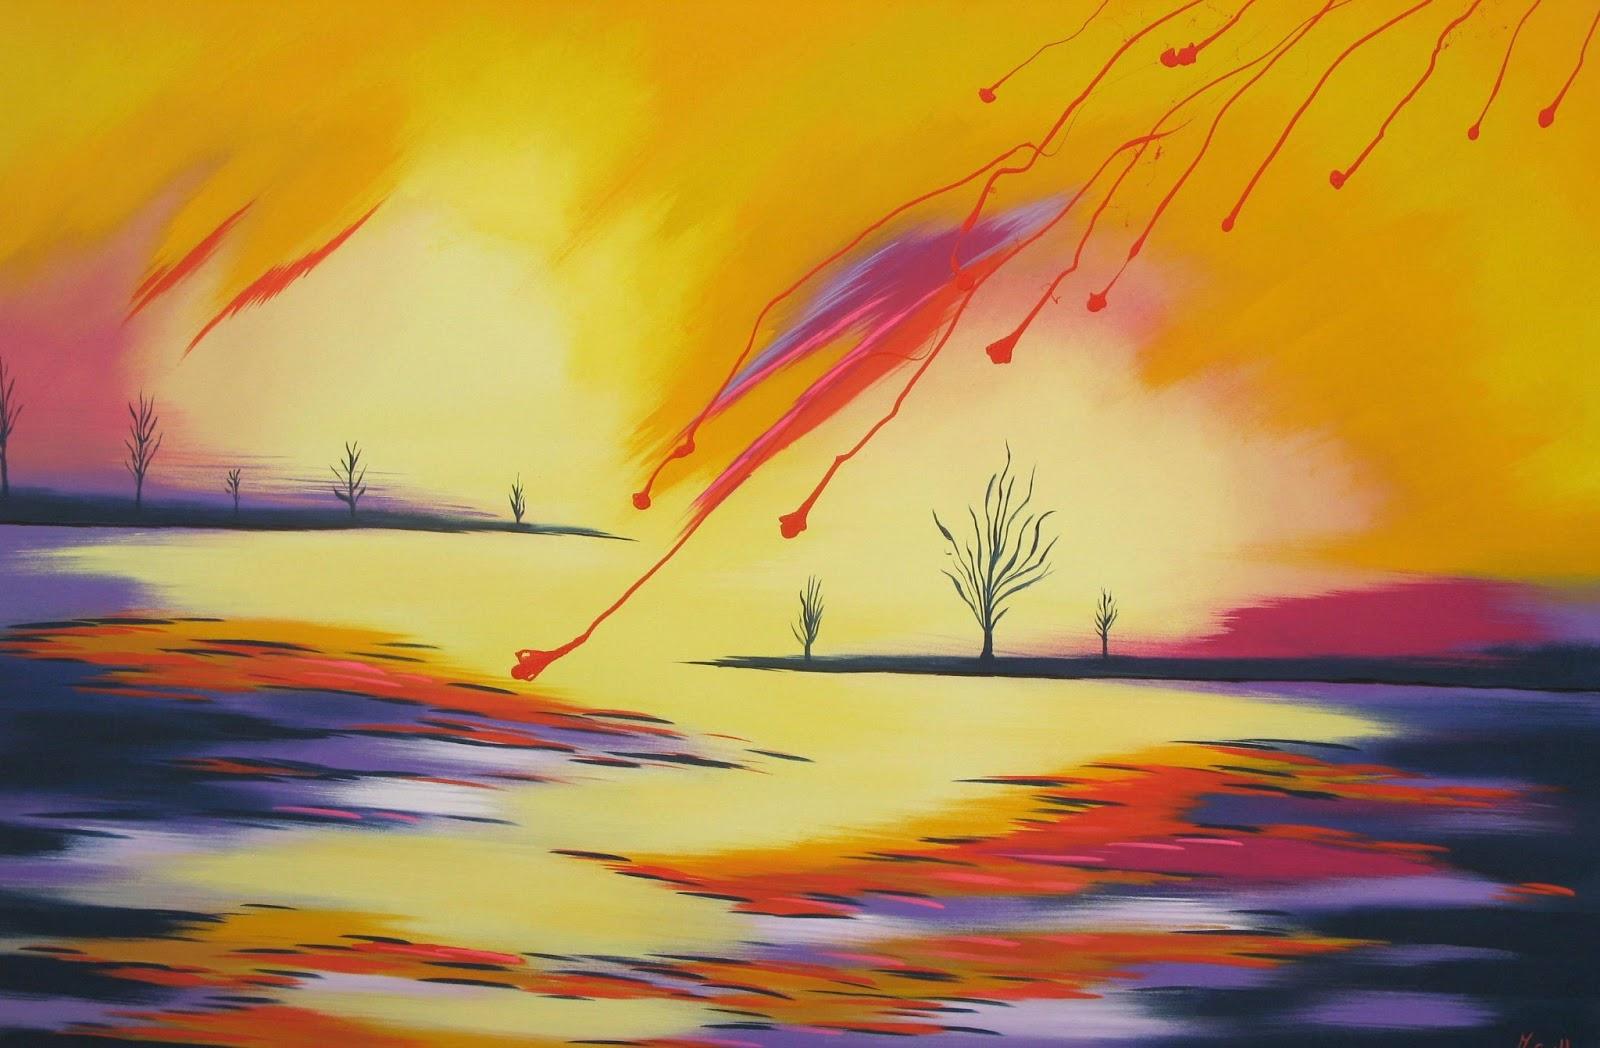 Cuadros modernos pinturas y dibujos paisajes modernos - Cuadros para principiantes ...